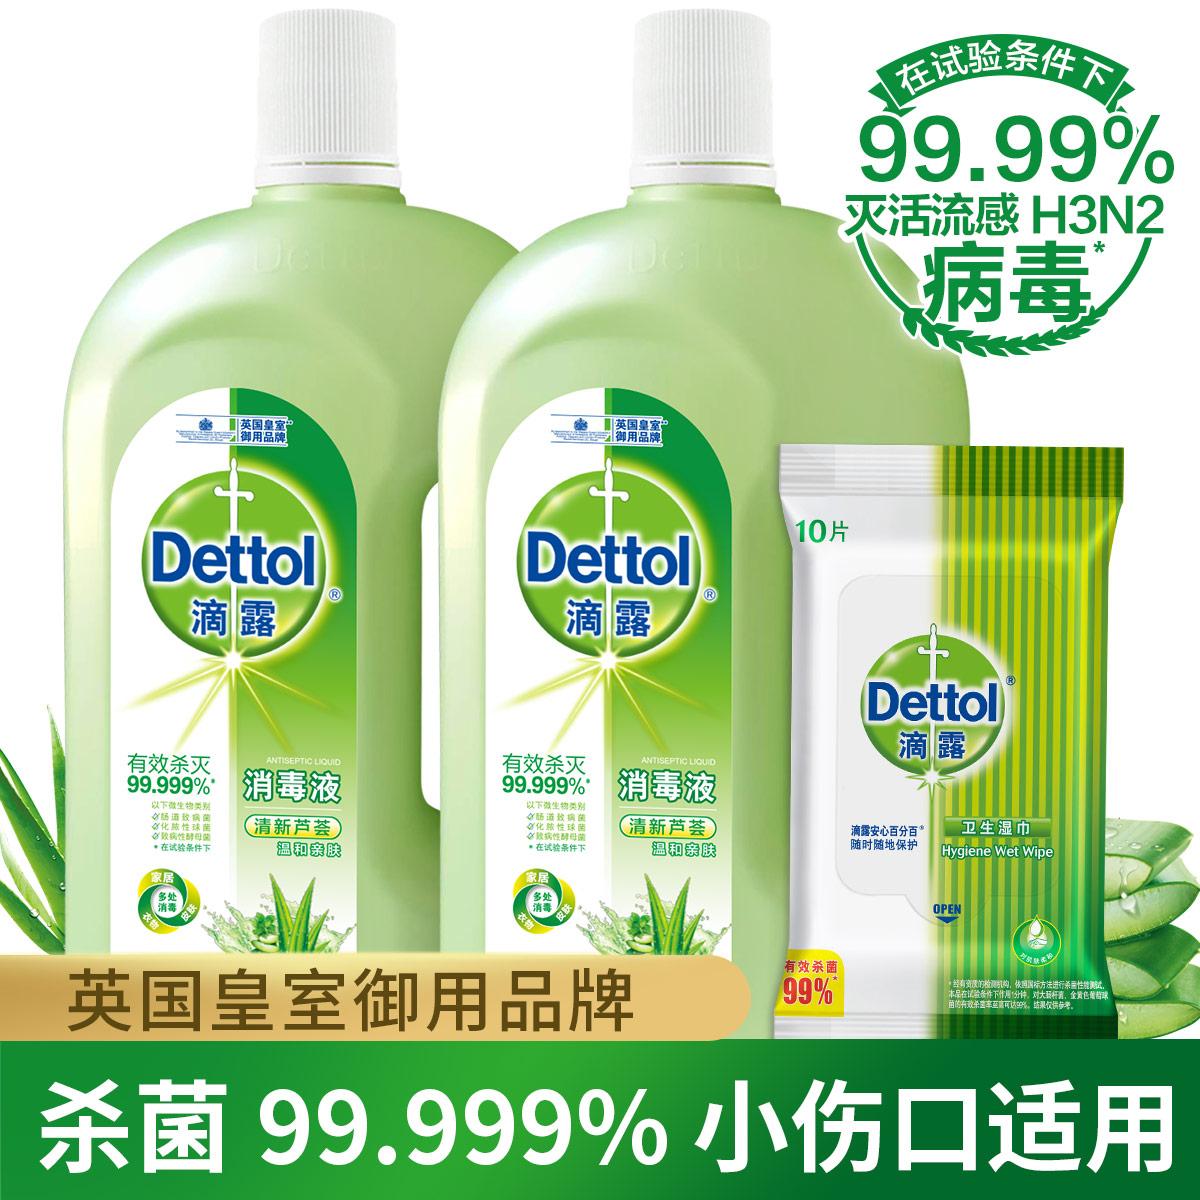 Dettol 滴露消毒液 杀菌除螨伤口适用1.2L/芦荟1L 两瓶装+湿巾10片